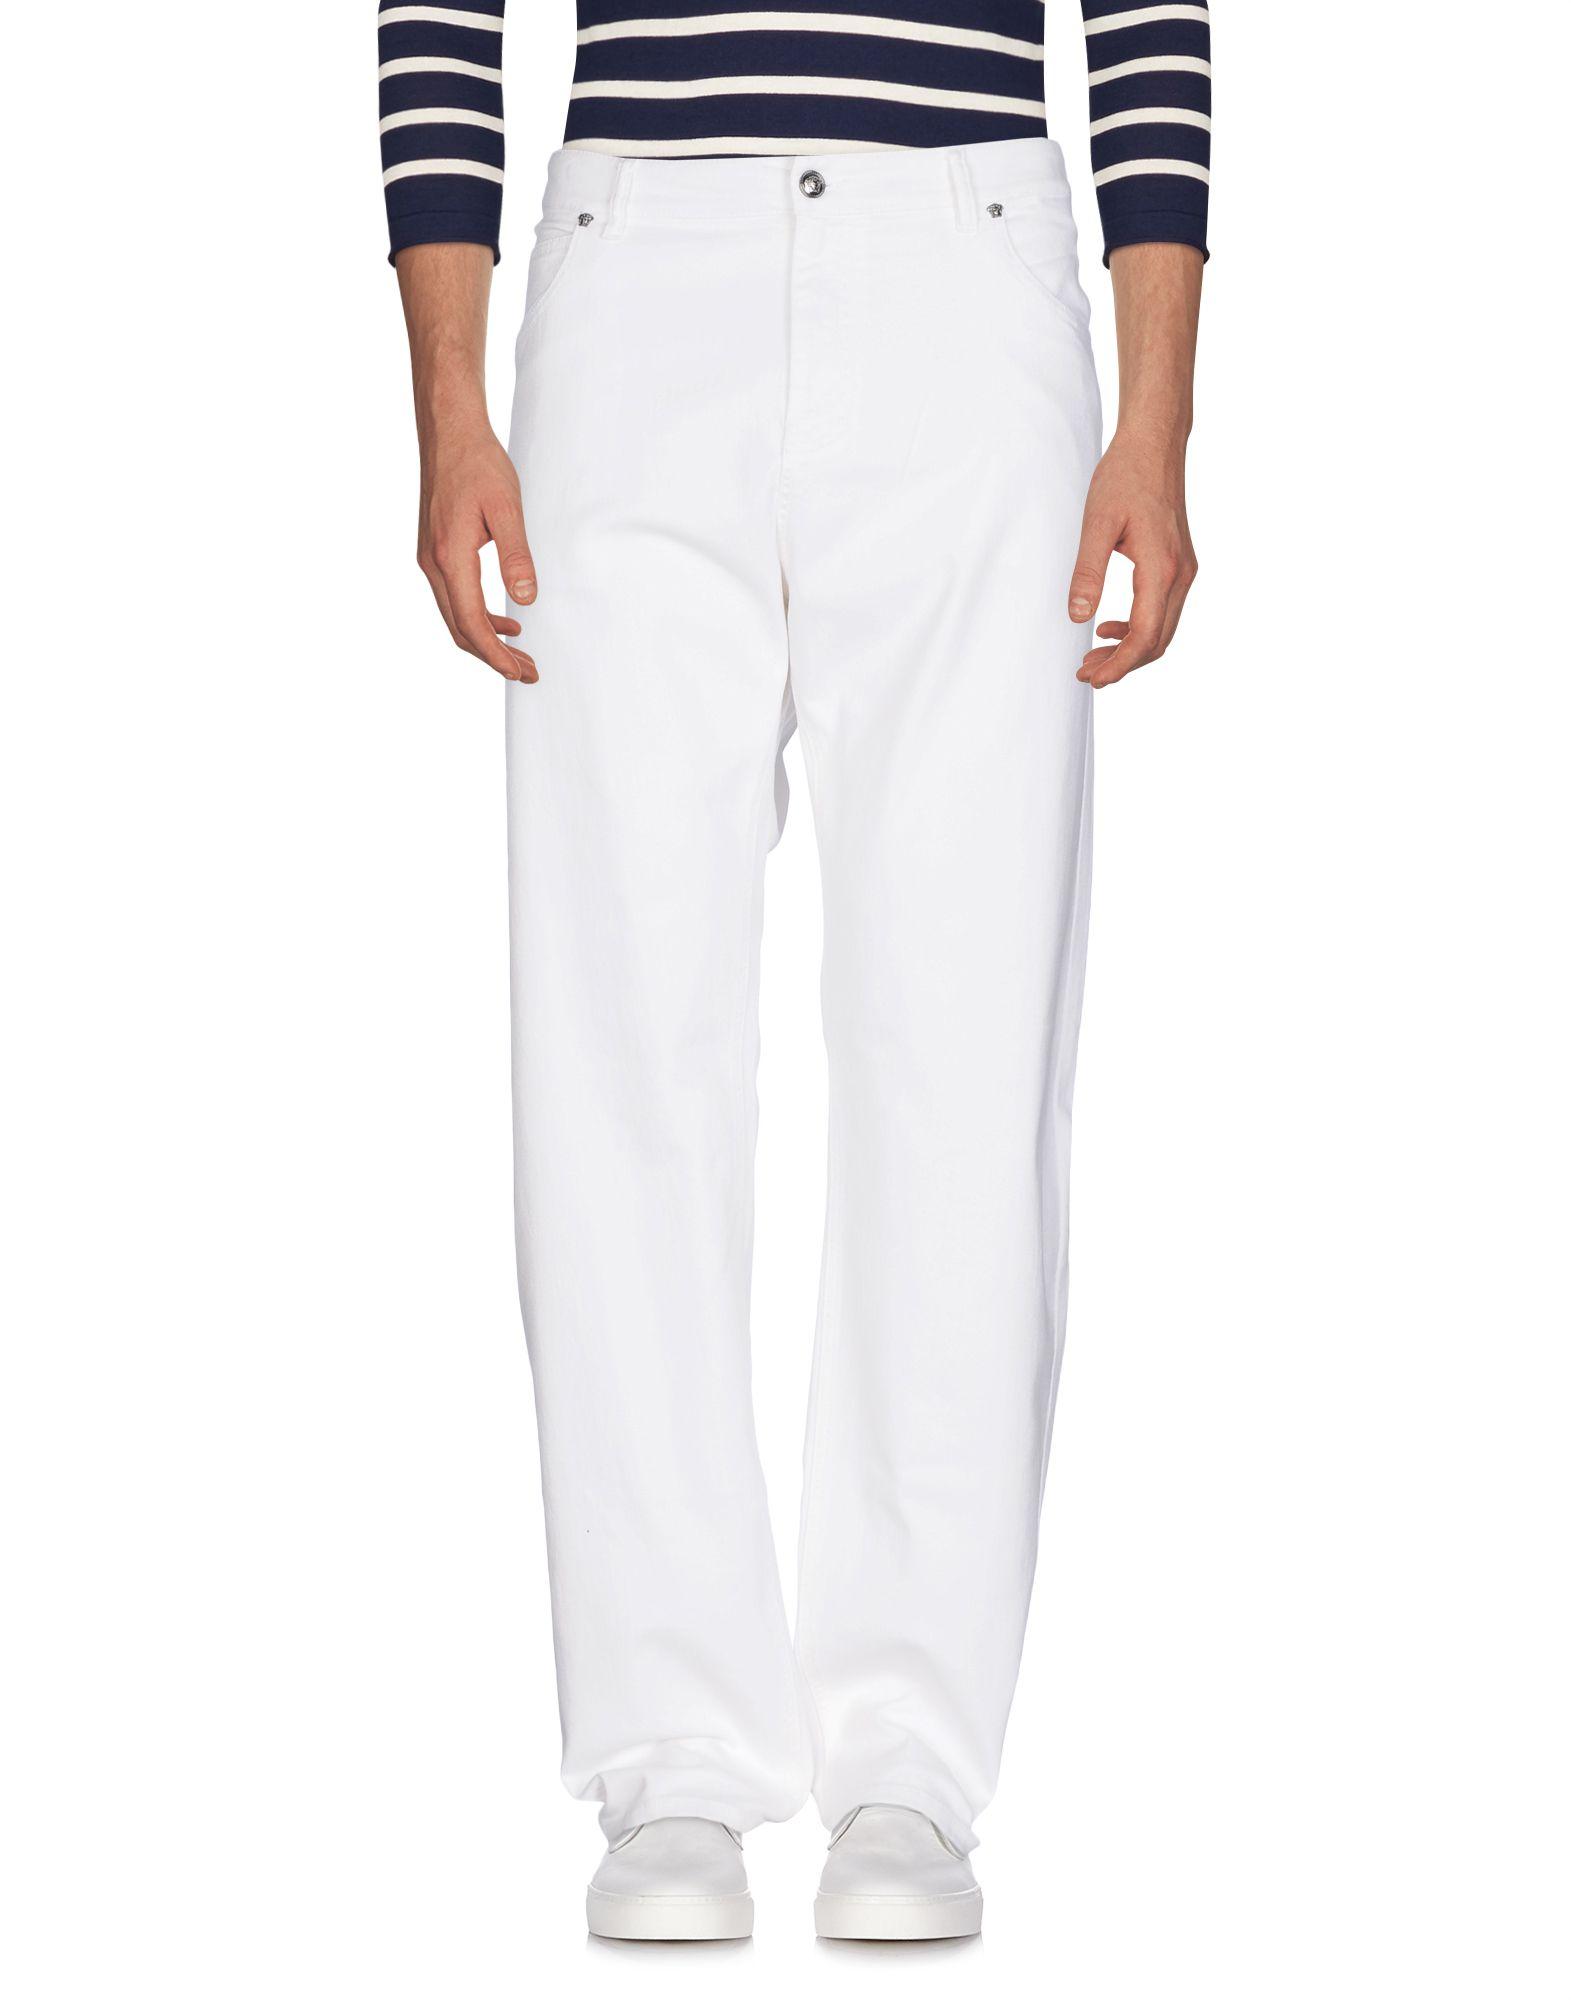 Pantaloni Jeans Versace Uomo - Acquista online su